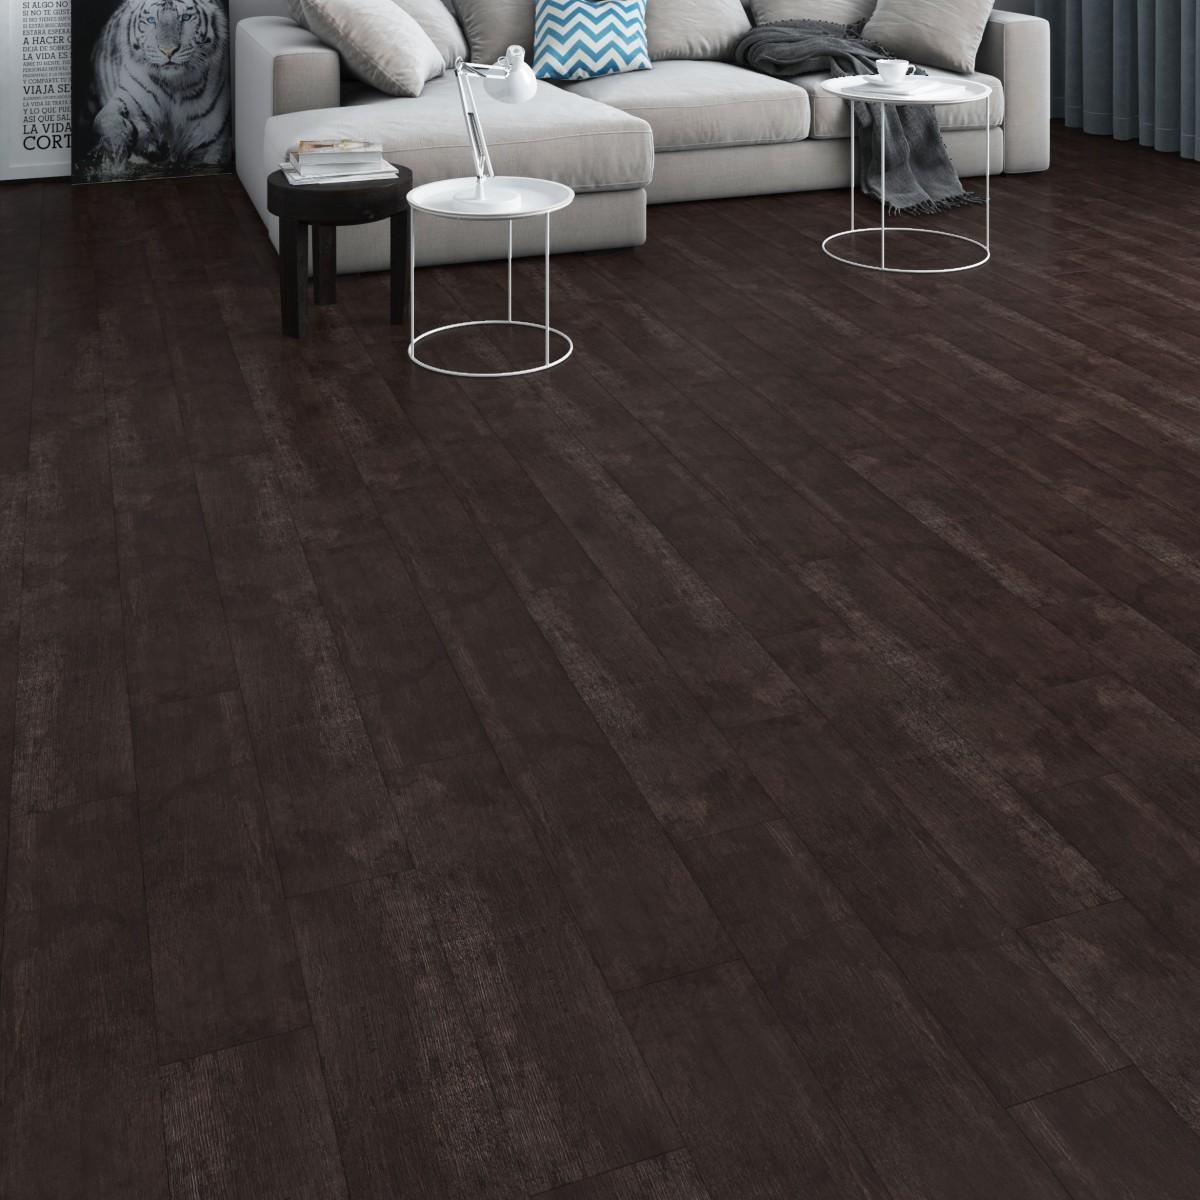 Ламинат Kronostar Карта 8 мм 32 класс 2.13 м2